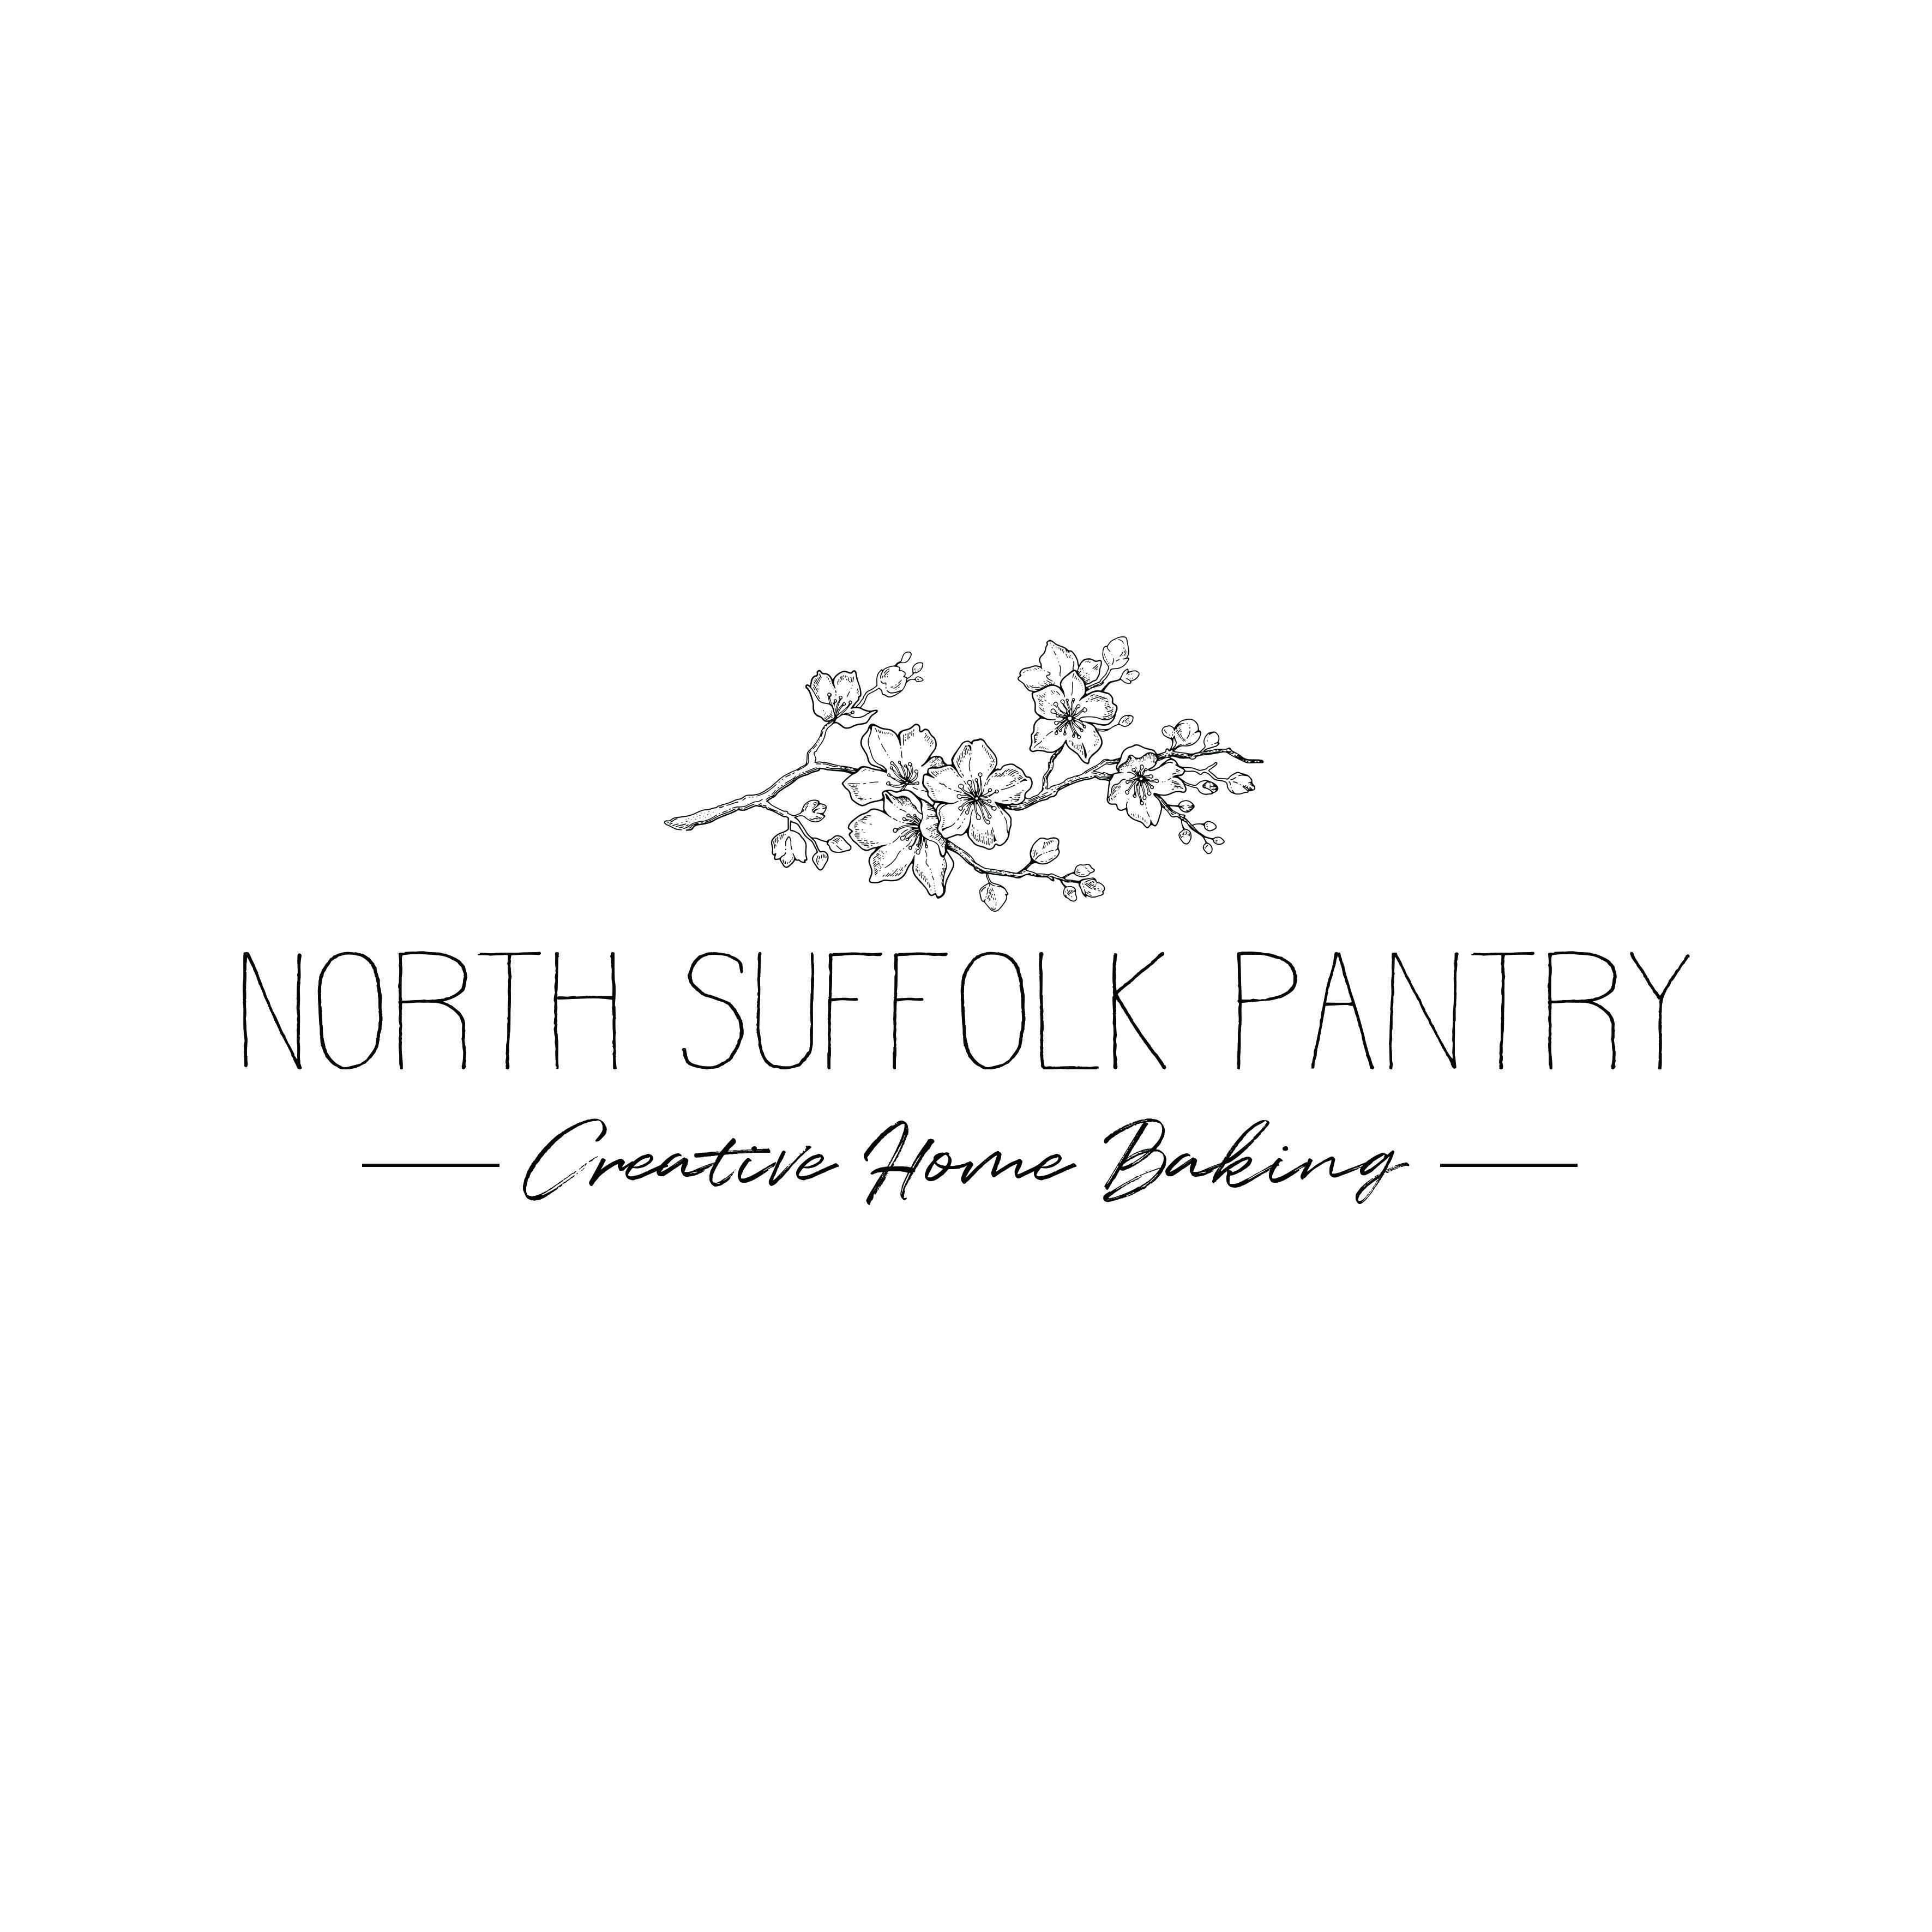 North Sufolk Pantry